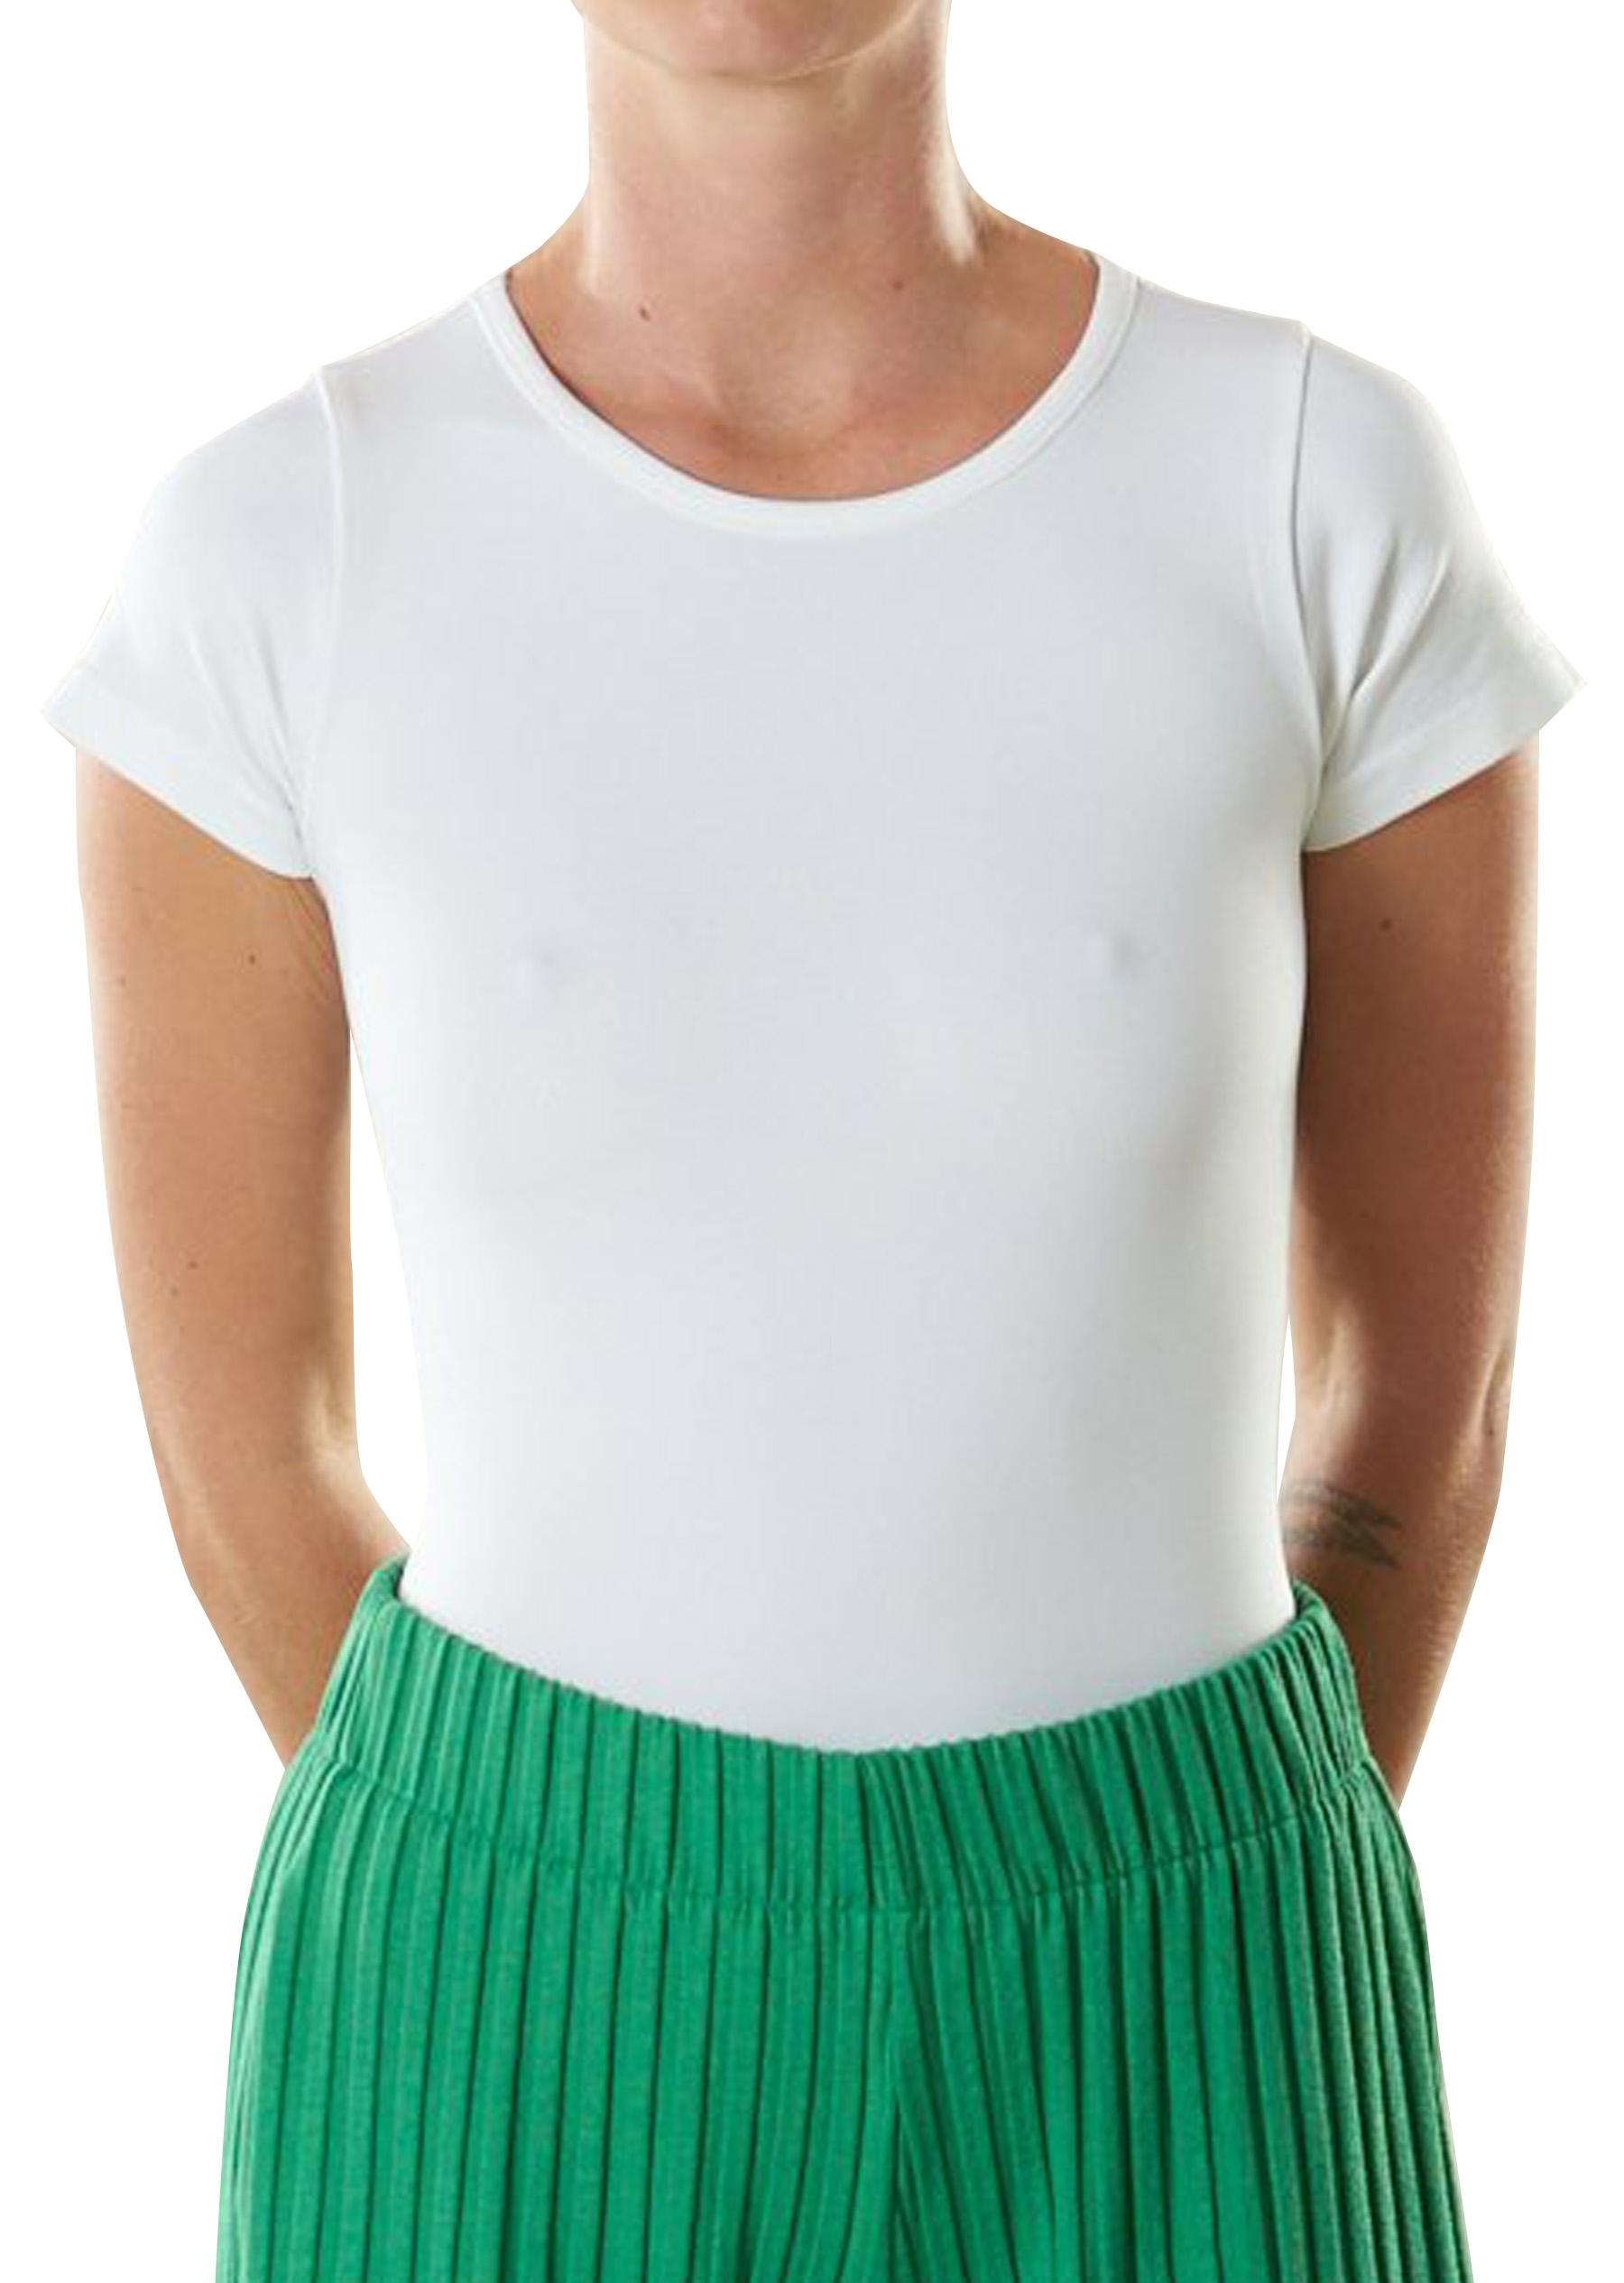 STRETCH Marce Bodysuit in White by Simon Miller - 1